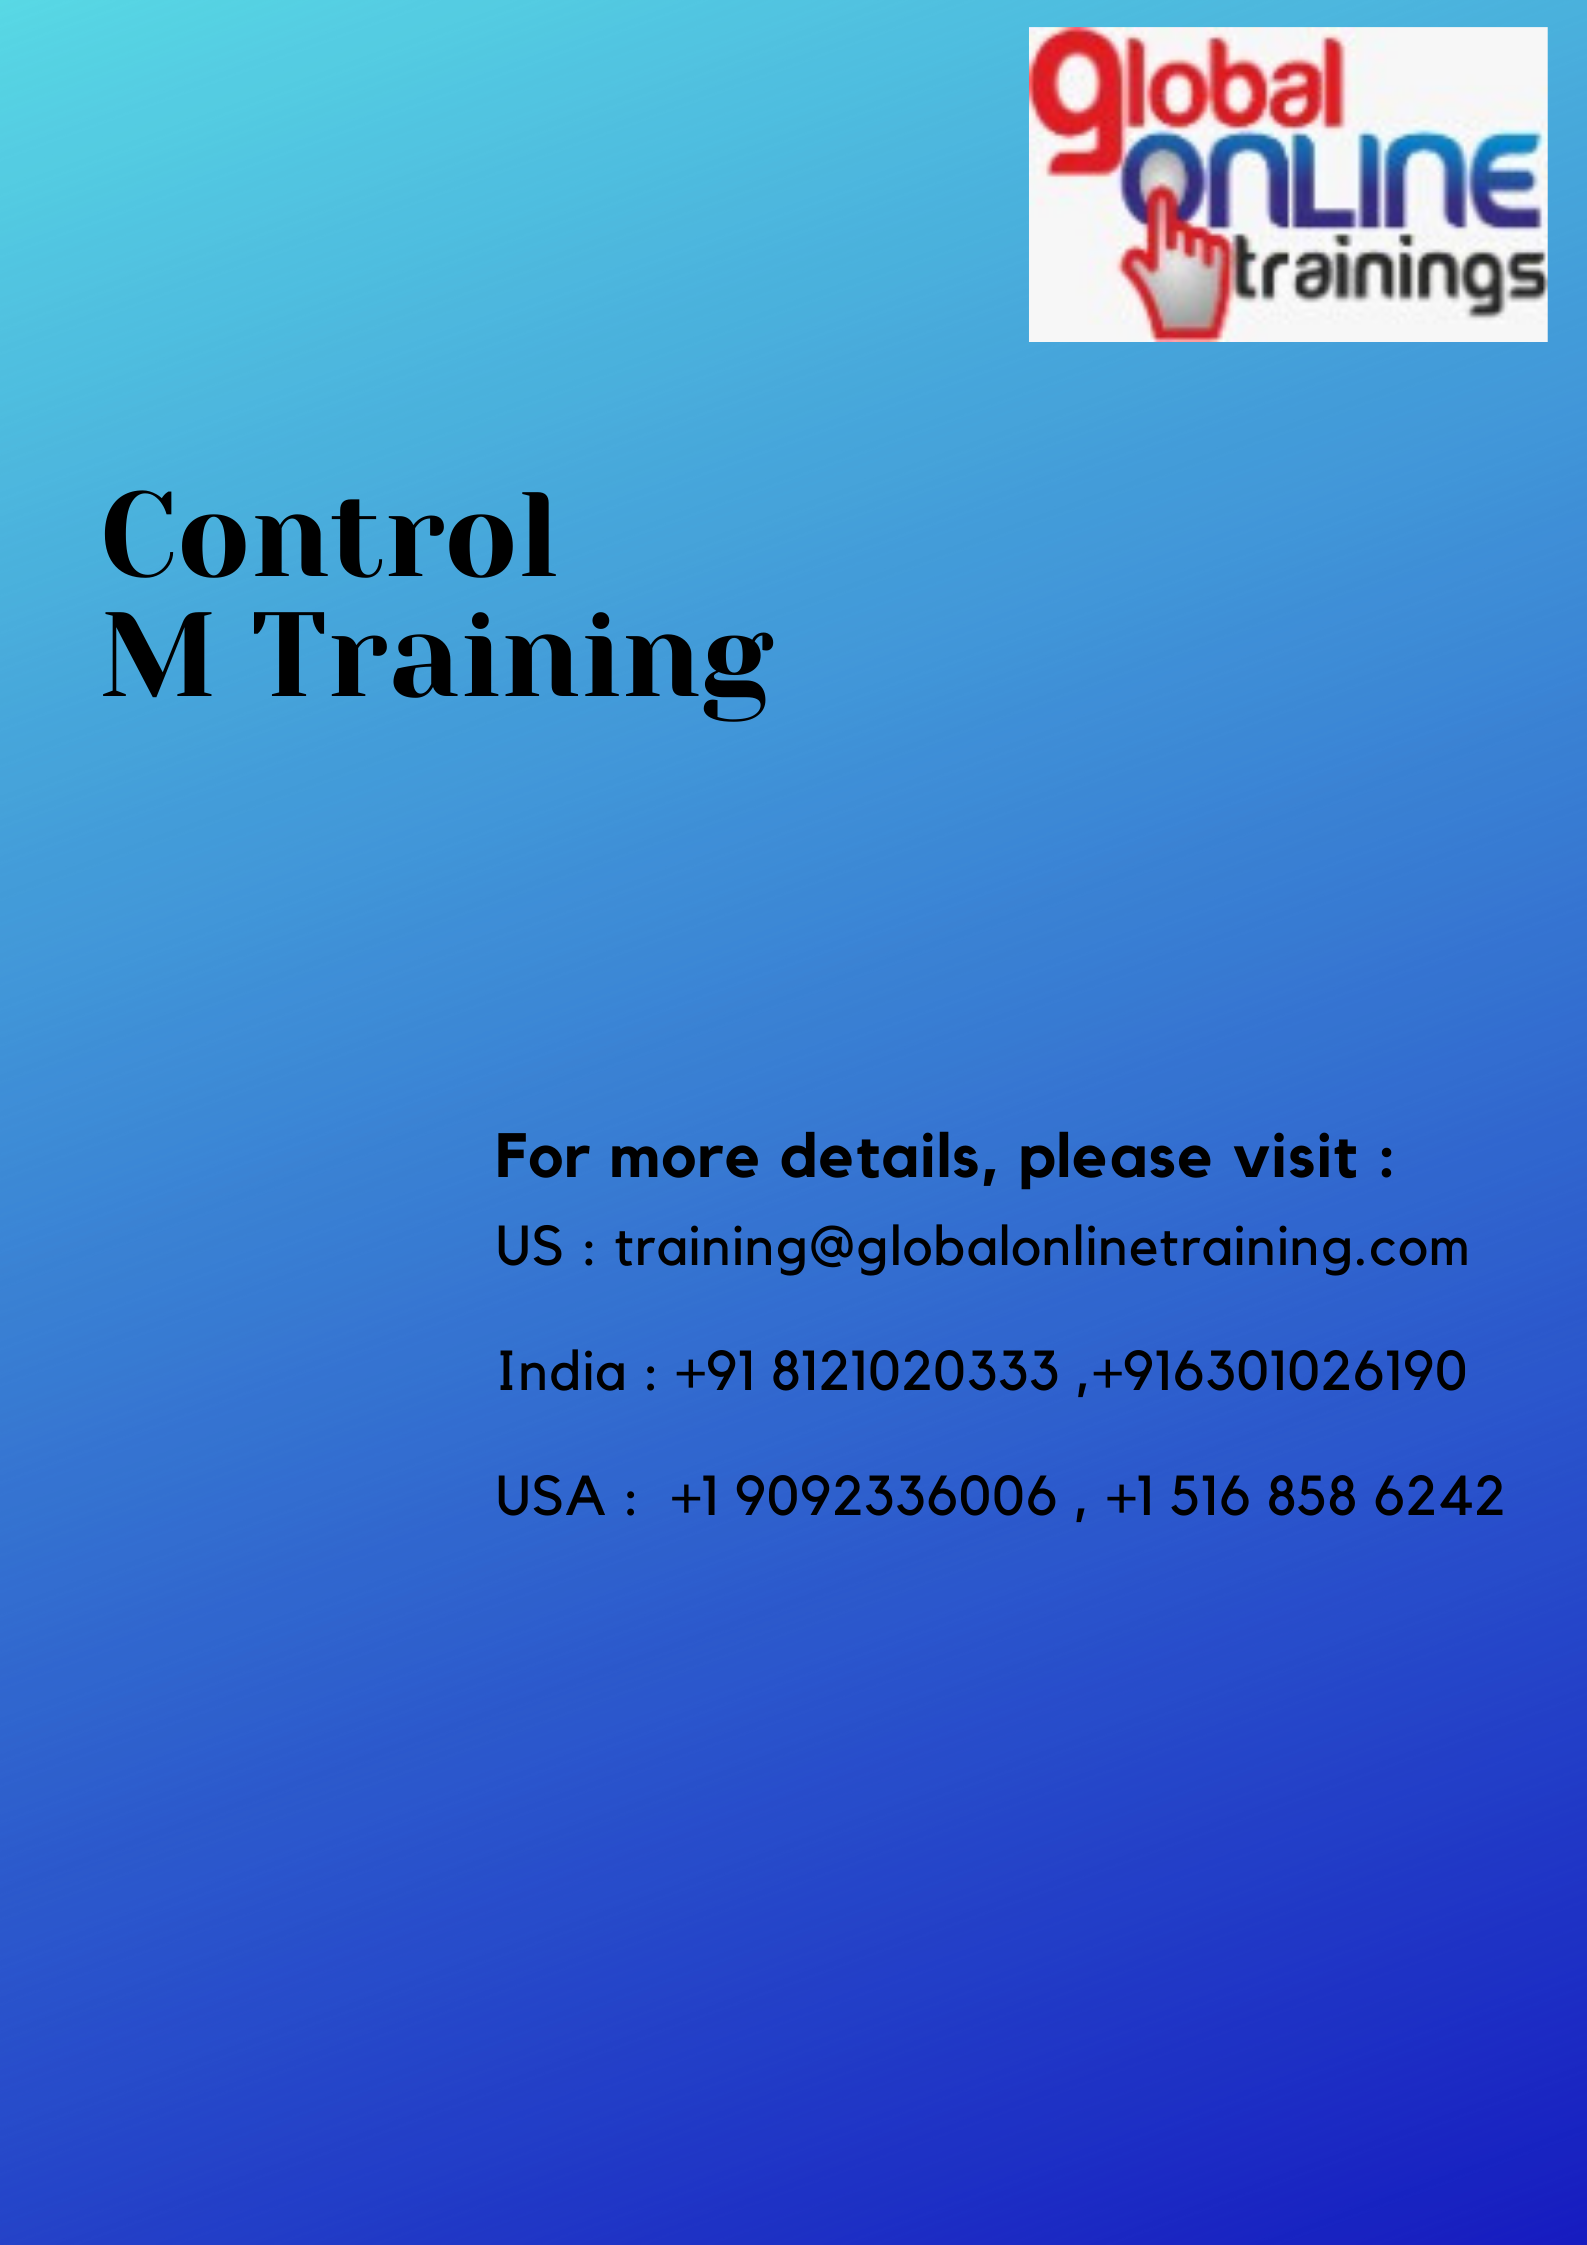 Control M Training Bmc Control M Online Training Course In 2020 Corporate Training Online Training Online Training Courses